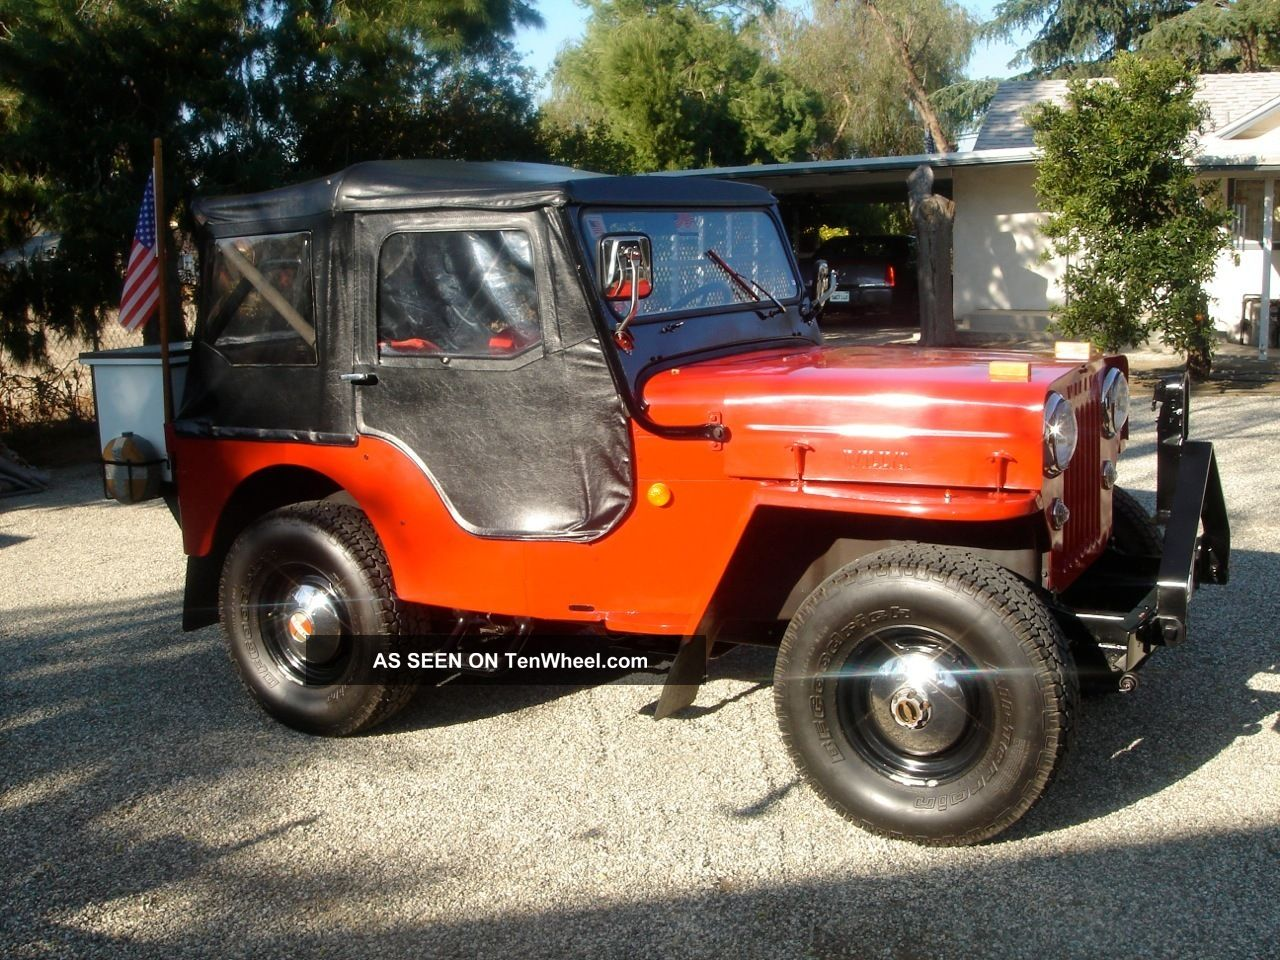 willys jeep 1954 cj3b. Black Bedroom Furniture Sets. Home Design Ideas